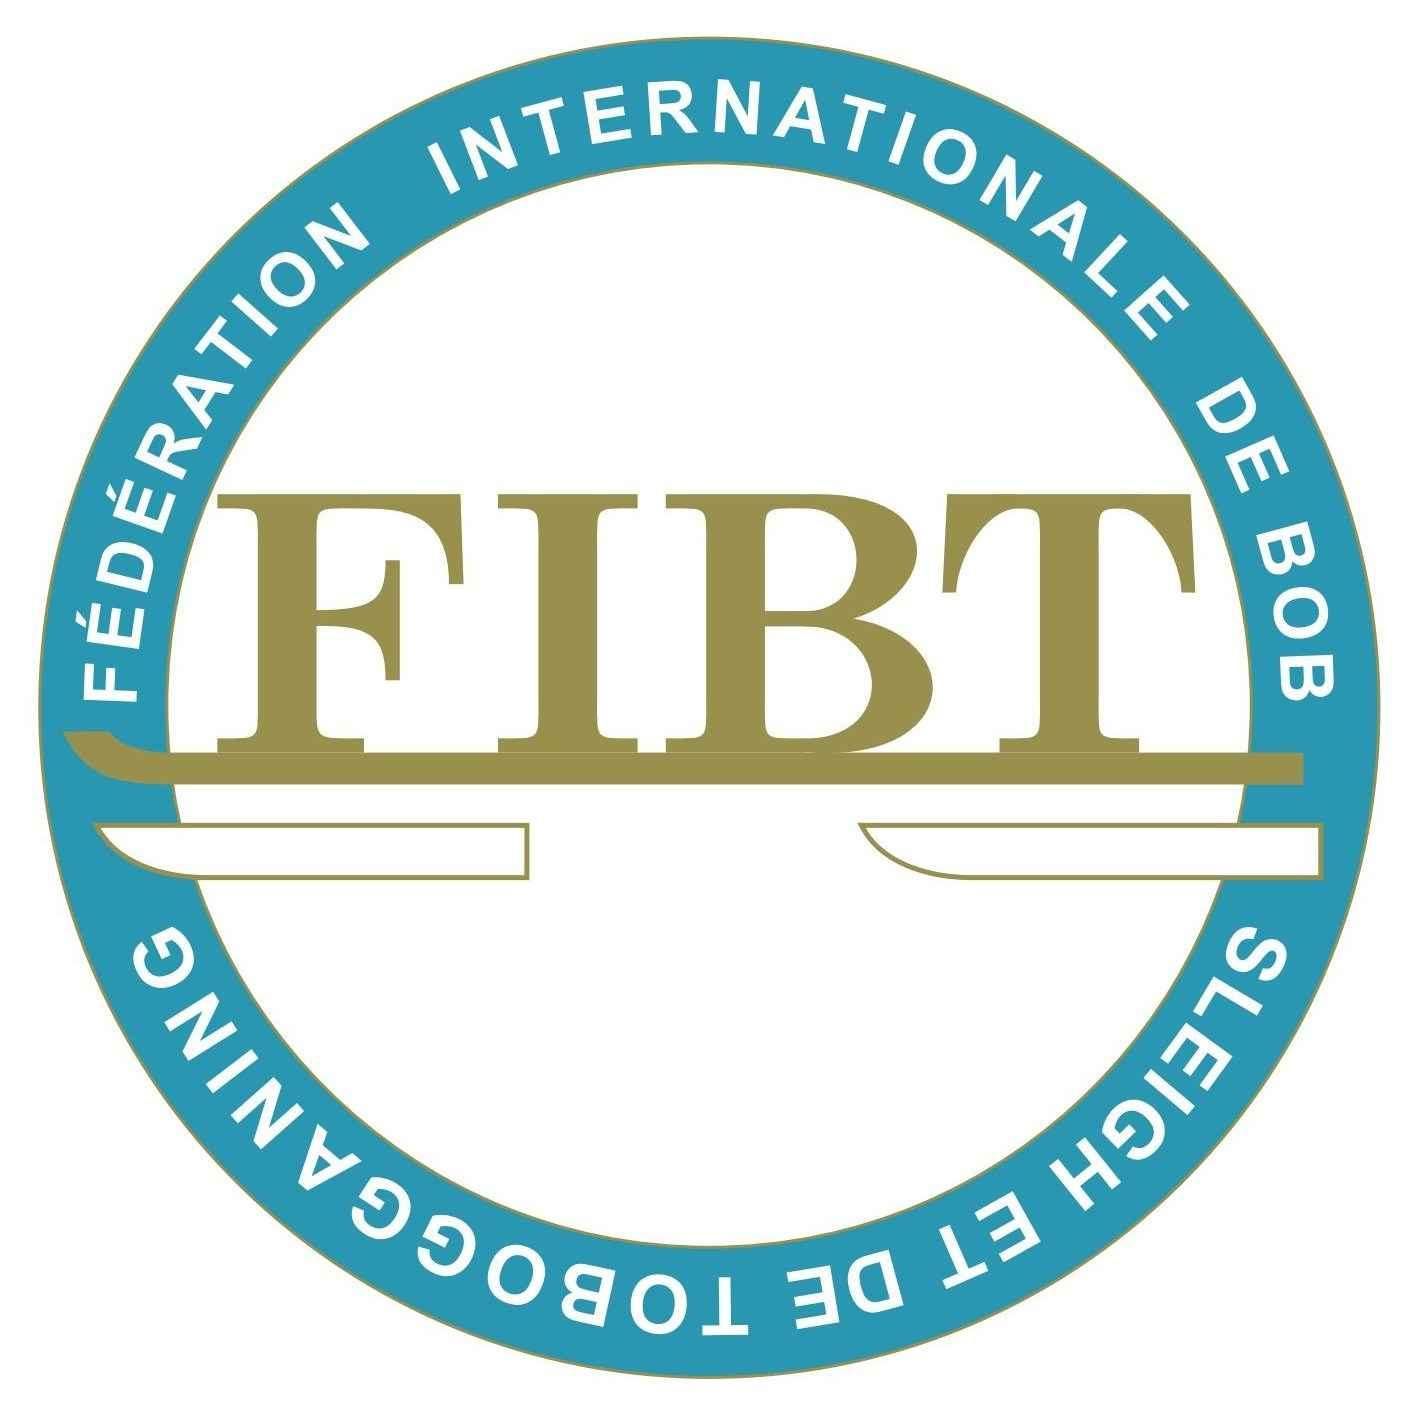 International Bobsleigh & Skeleton Federation (IBSF) Logo [EPS File] png